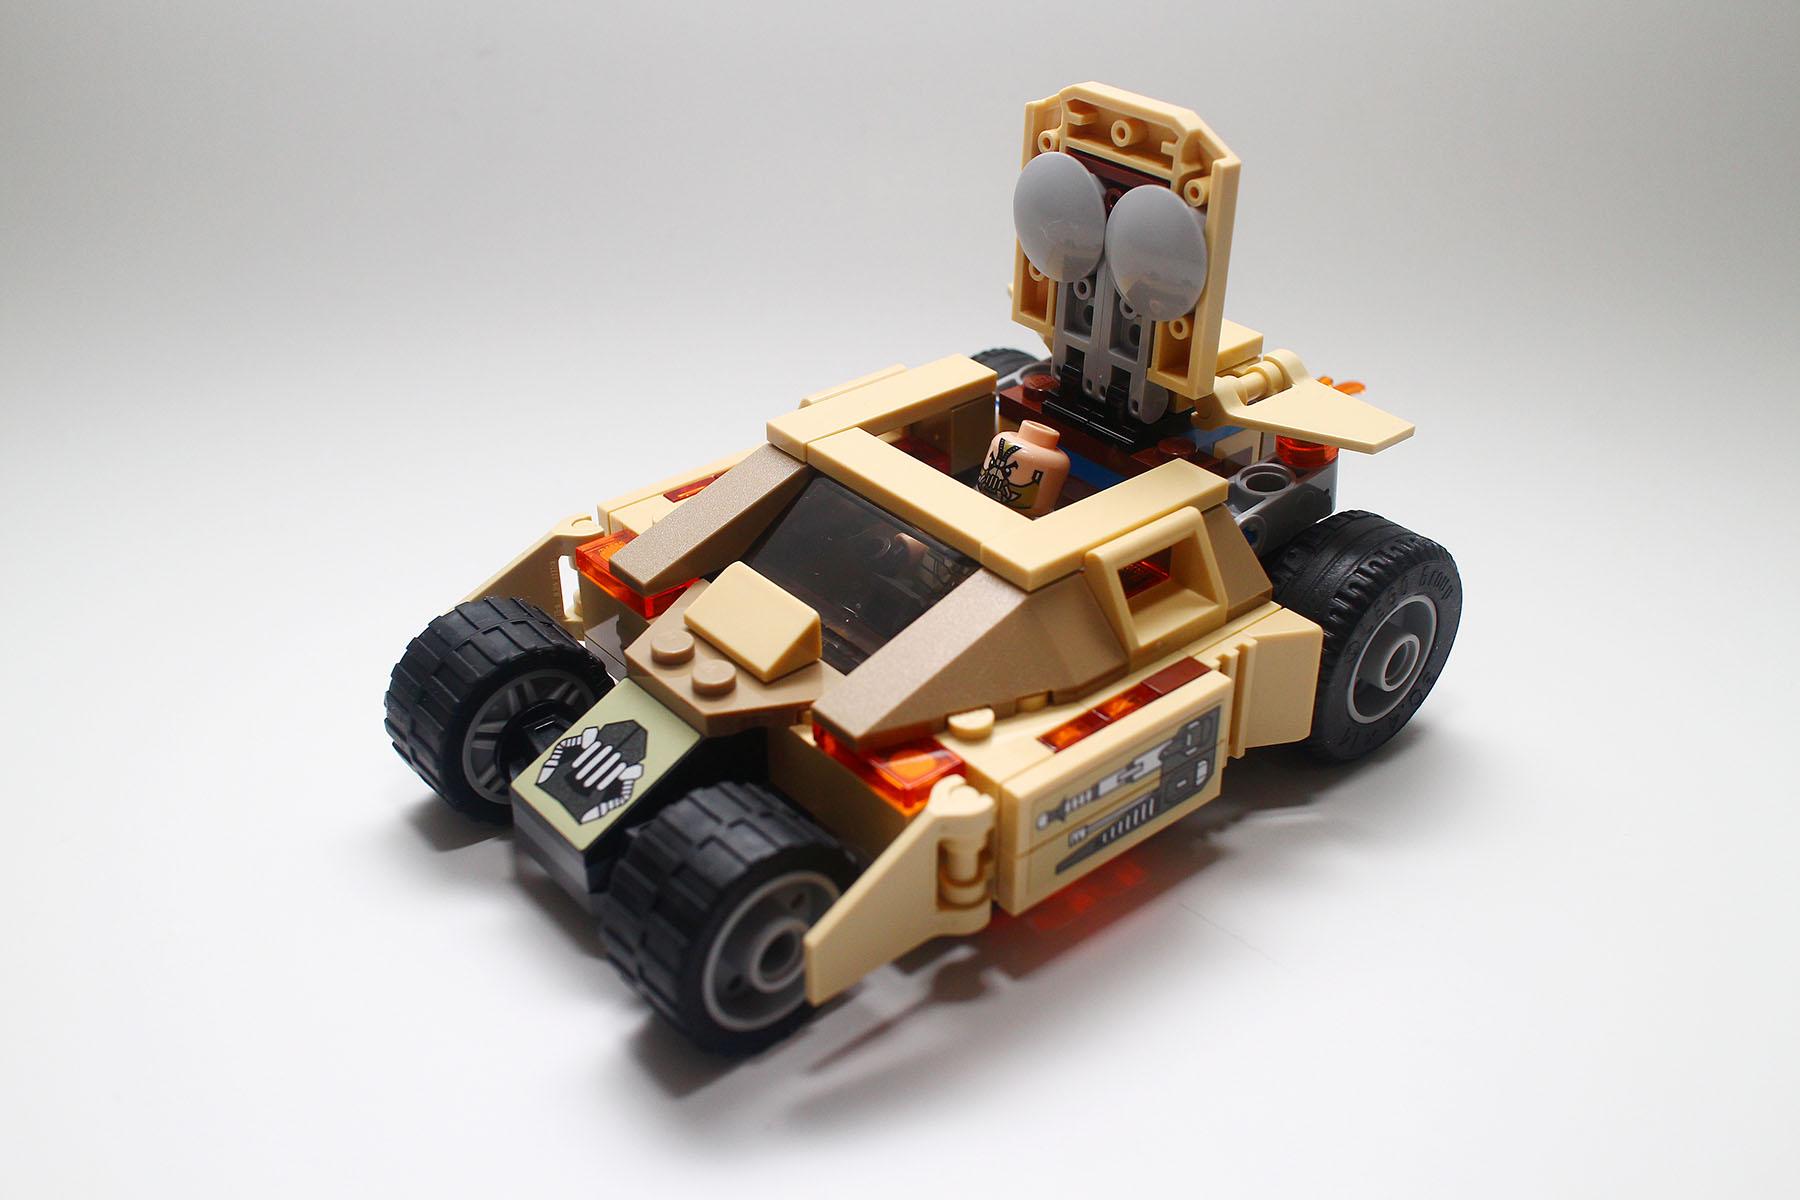 LEGO.com Videogames LEGO® Video Games - LEGO Batman 3